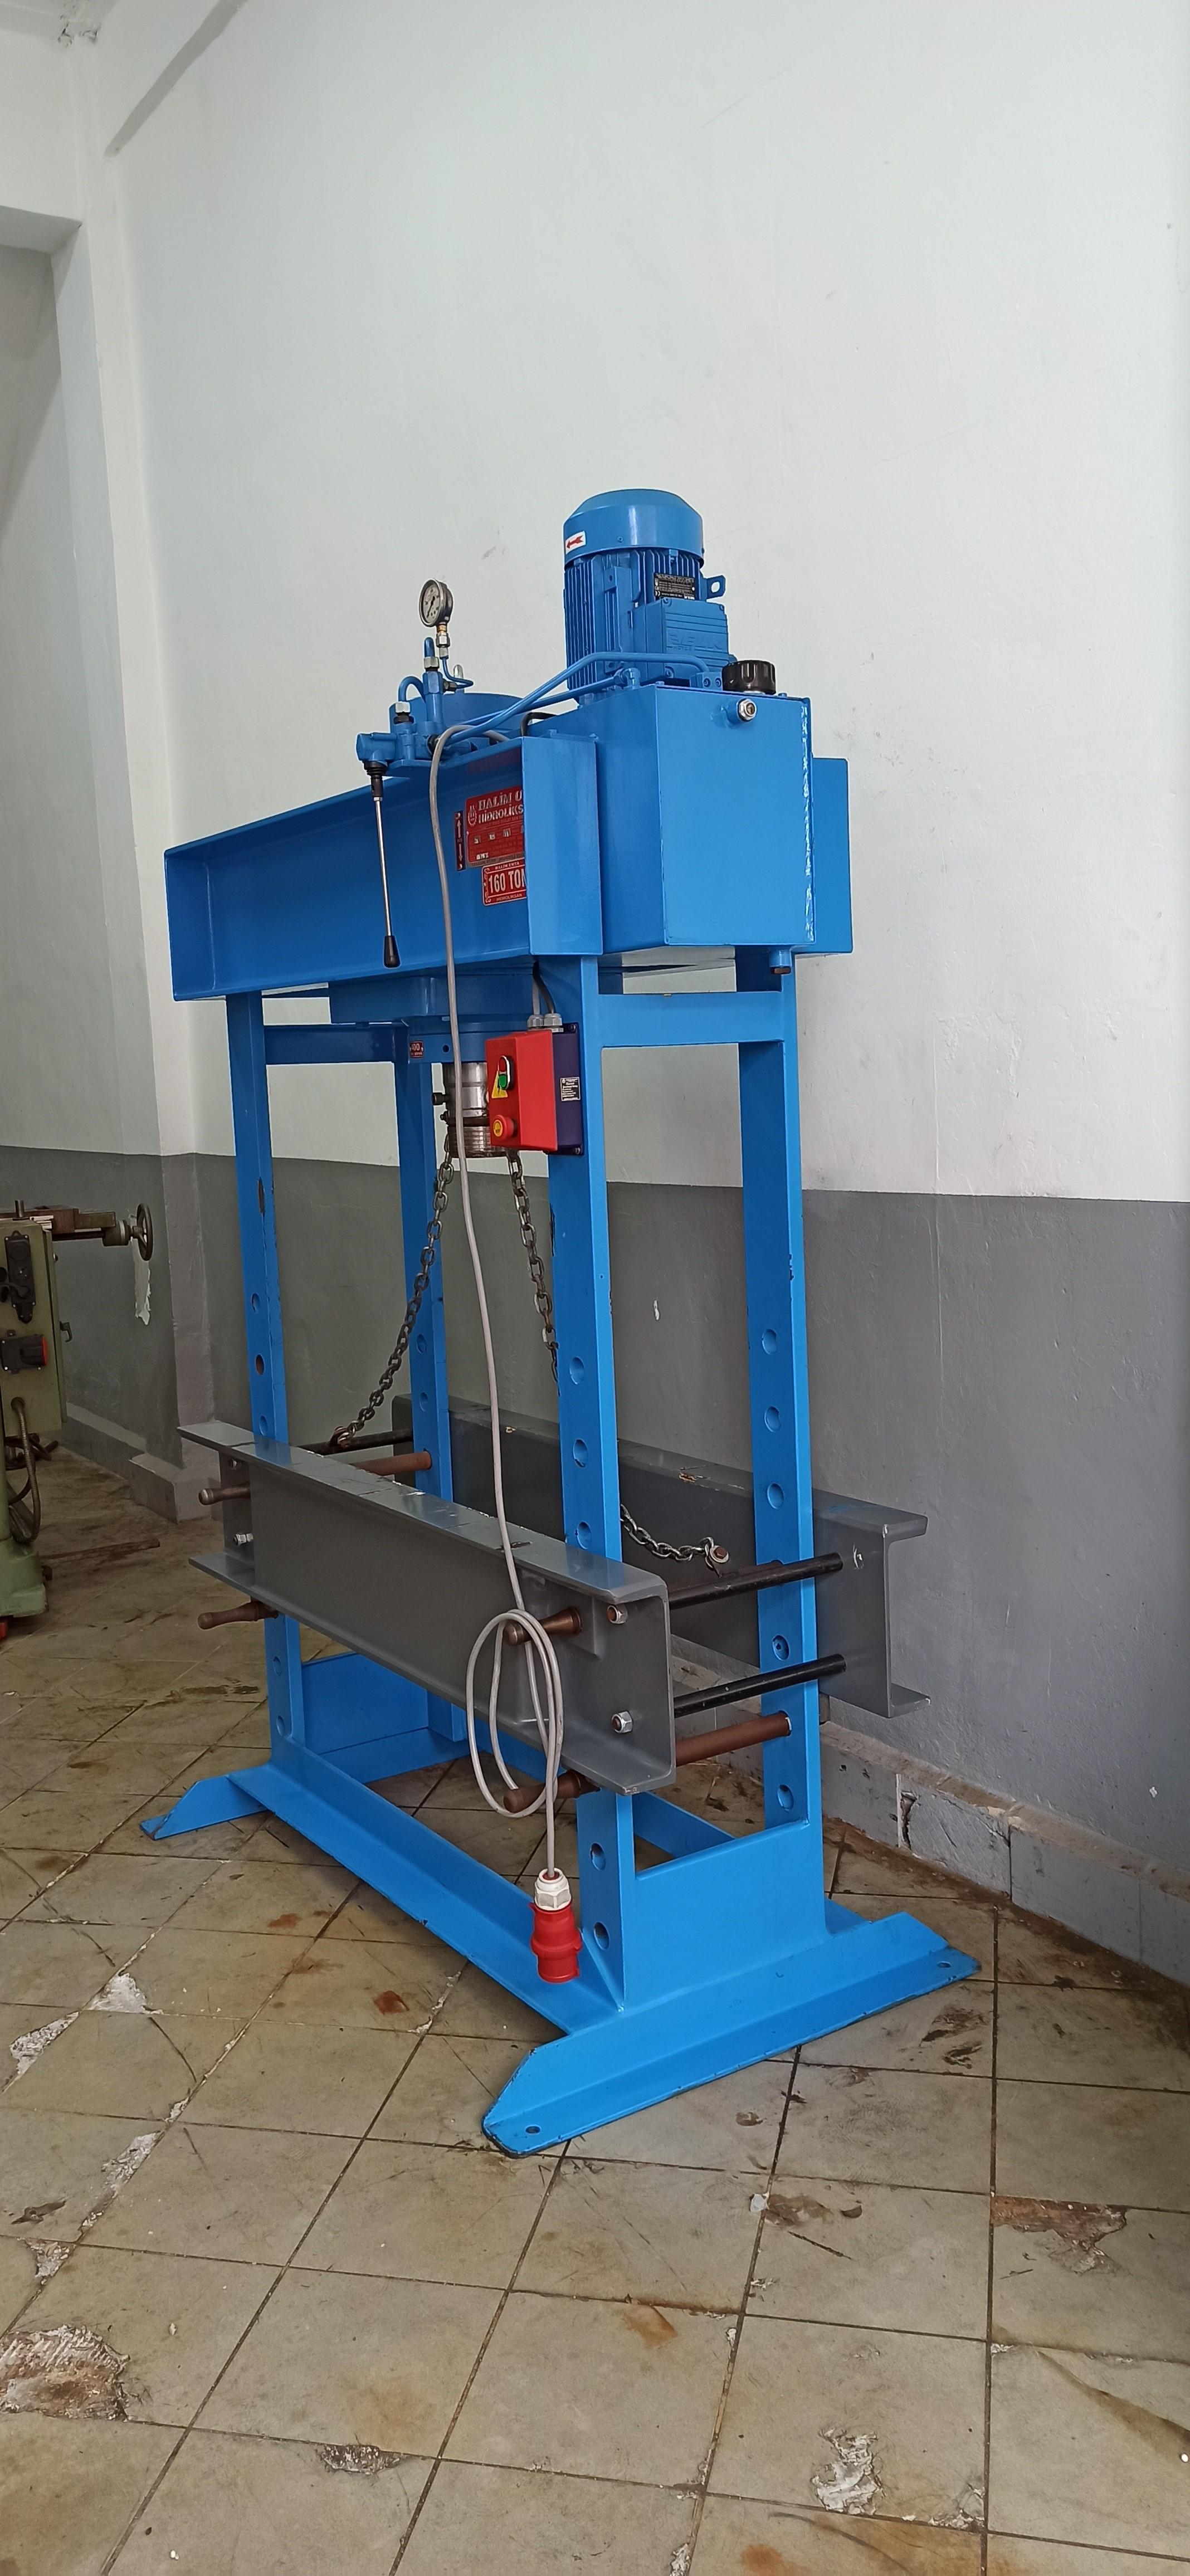 İkinci El 2019 Model 160 Ton Hidrolik Atölye Presi